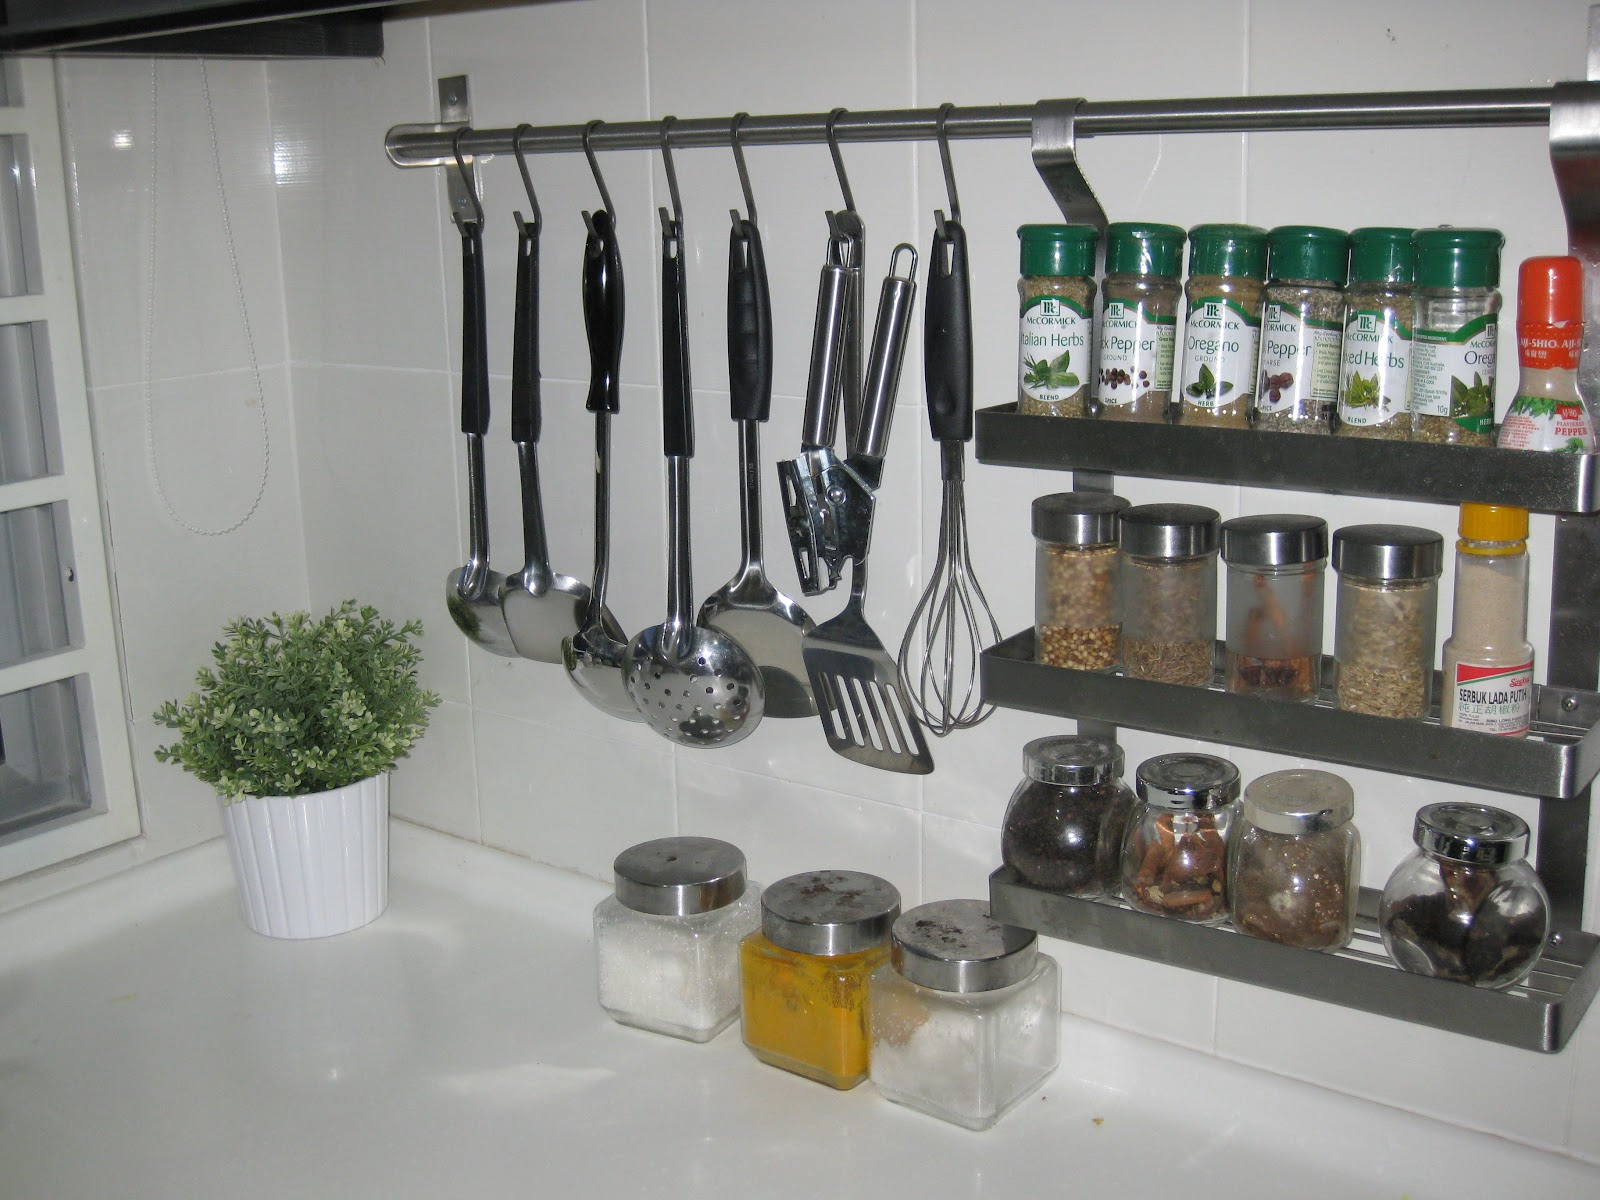 Cara Nak Hias Dapur Kecil Desainrumahid com